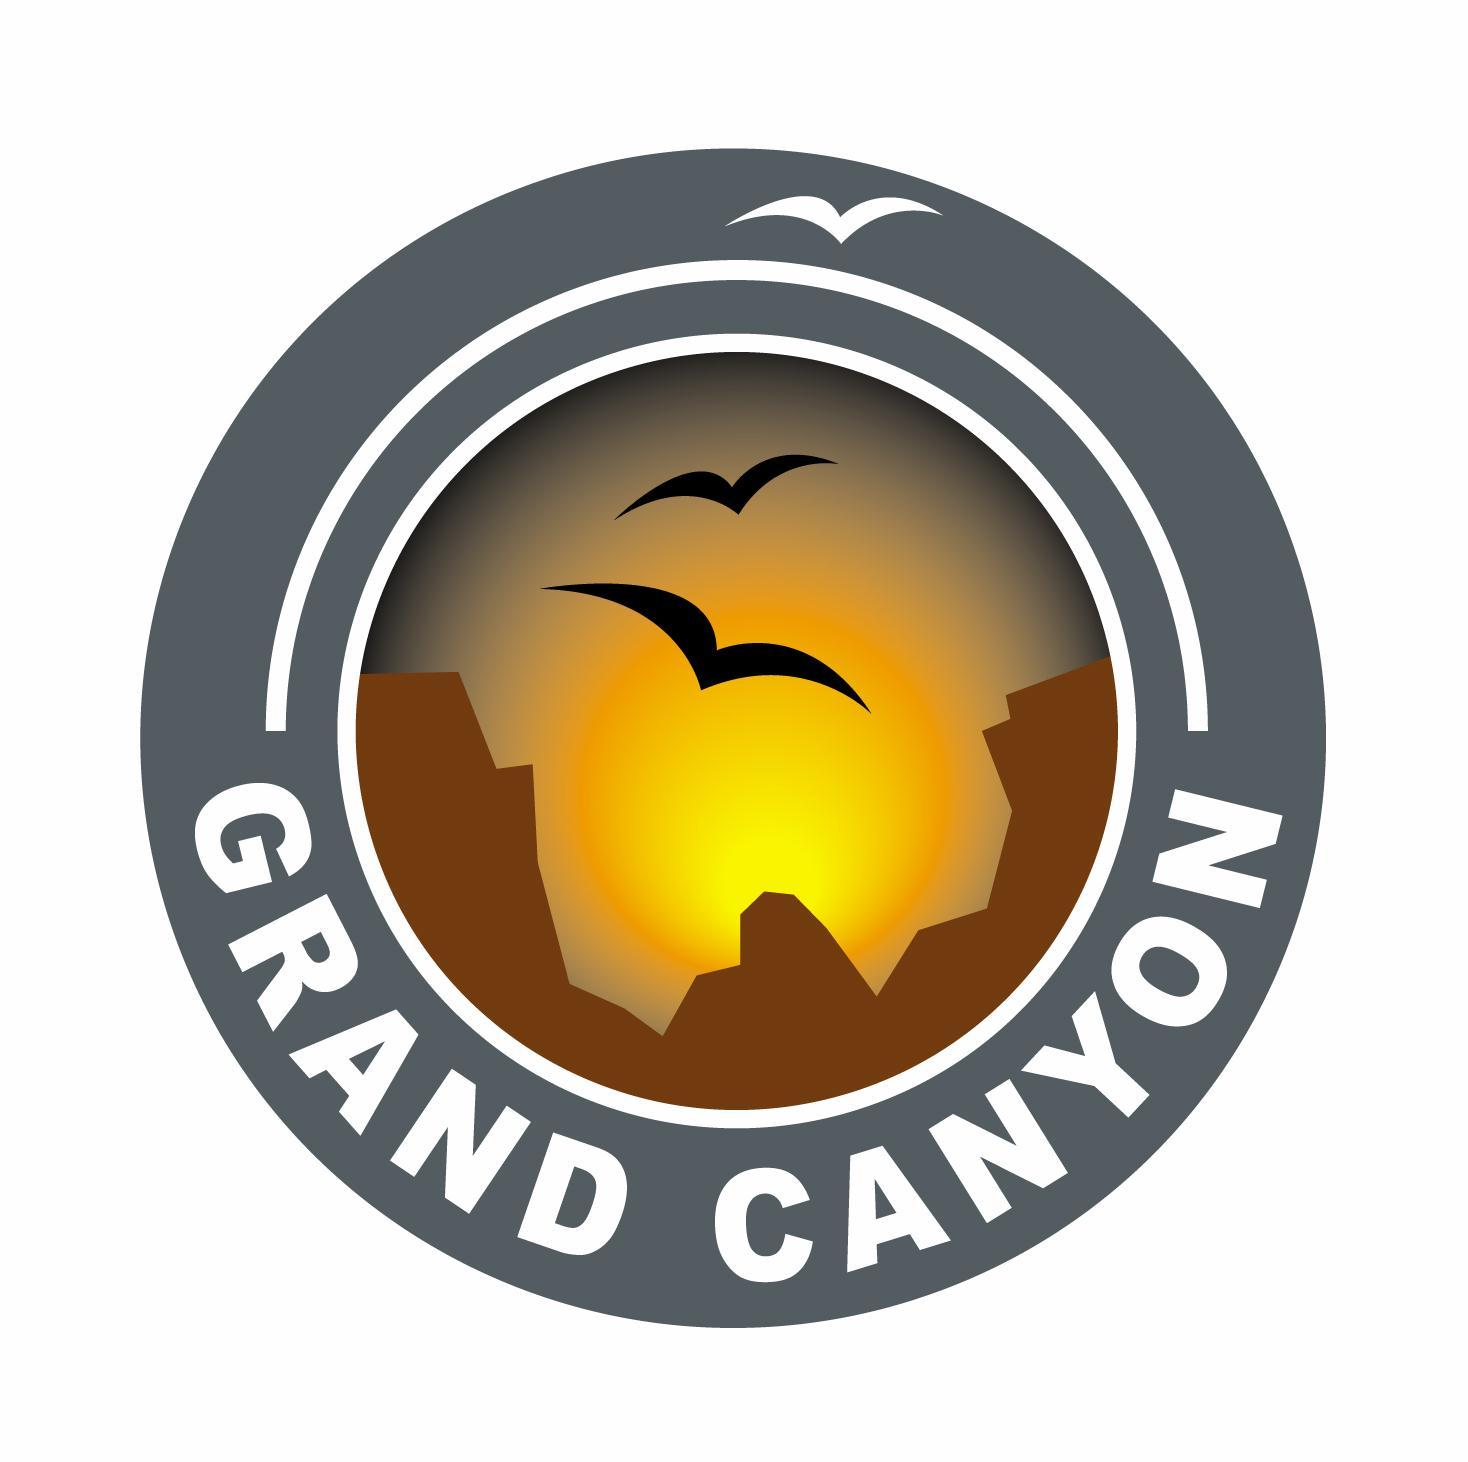 grand canyon richmond 1 trekkingzelt 1 personen zelt. Black Bedroom Furniture Sets. Home Design Ideas